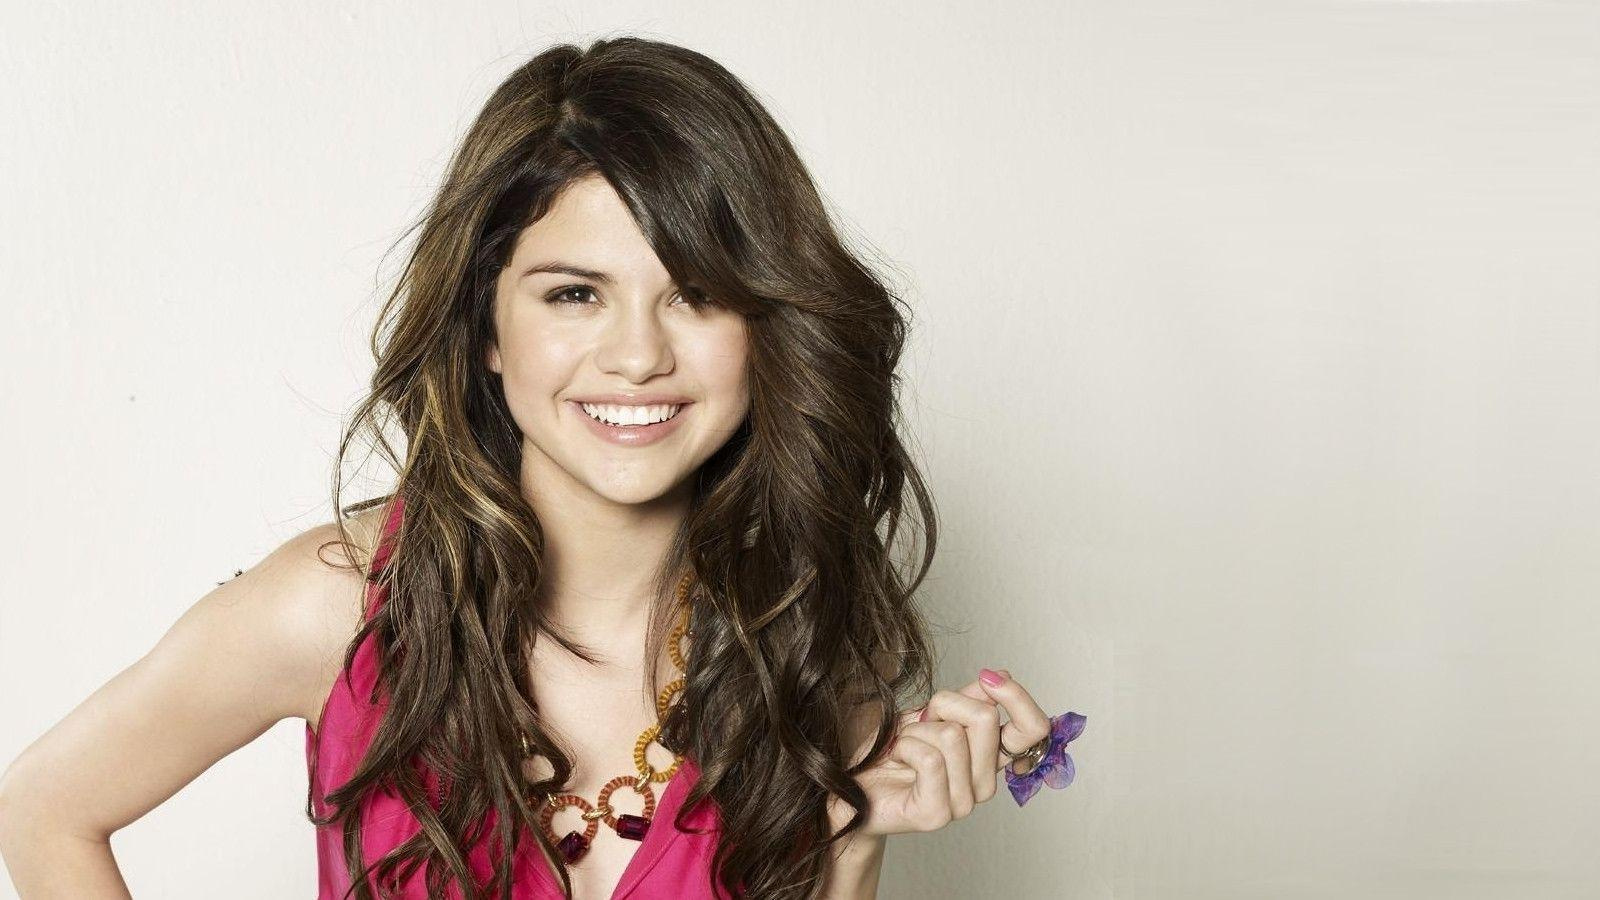 selena gomez hd wallpaper × Selena Gomez Hd Wallpapers